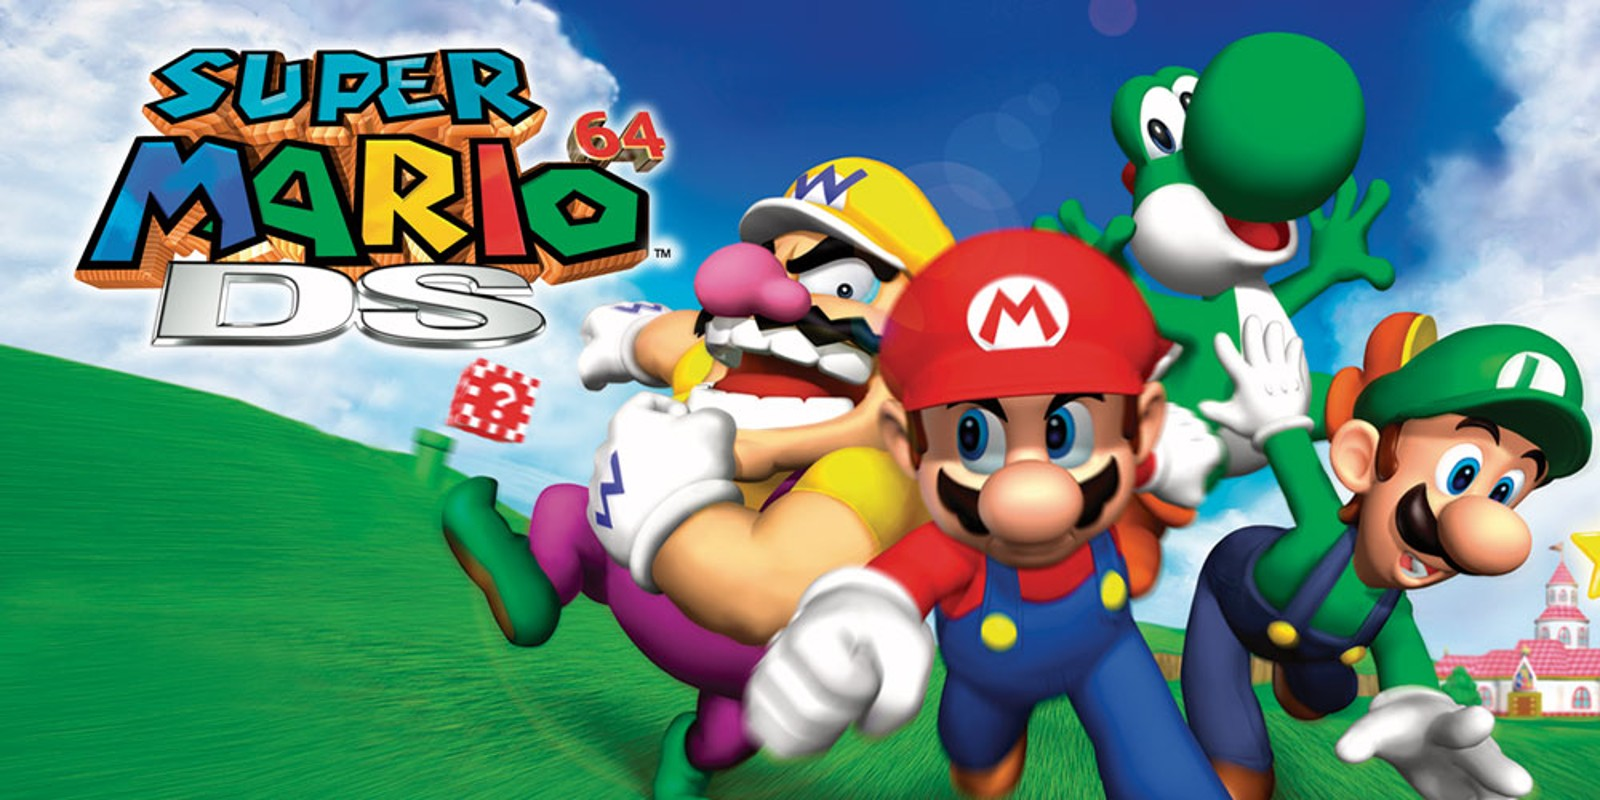 Super Mario 64 Ds Nintendo Ds Spiele Nintendo